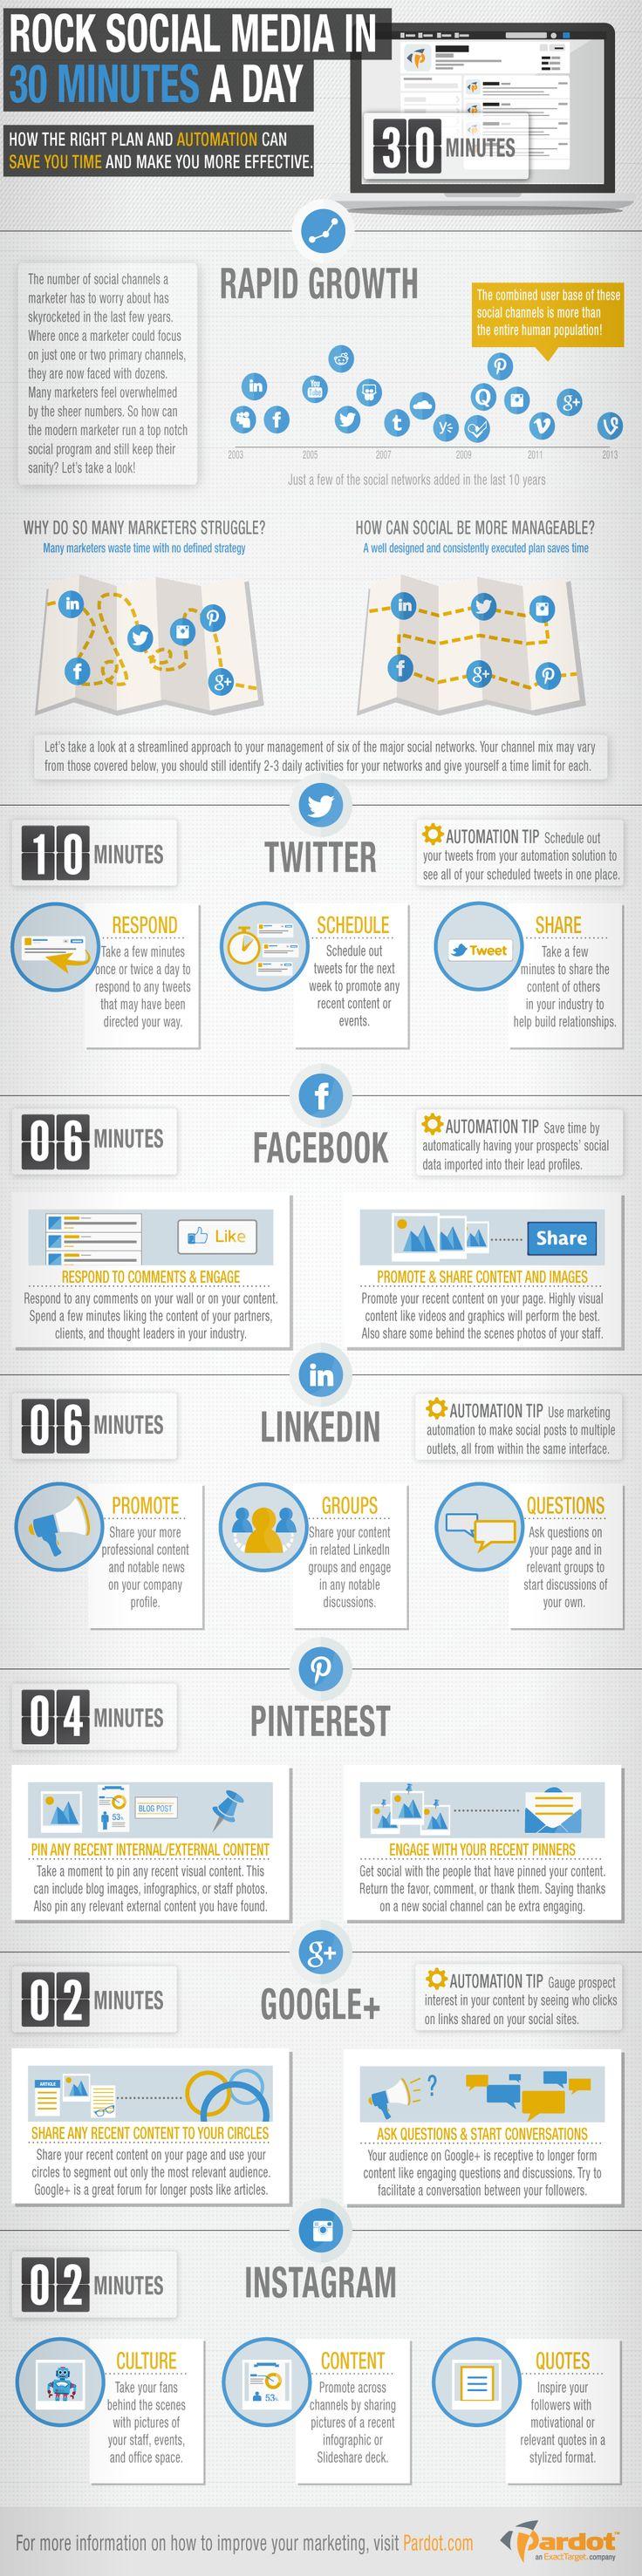 30 Minute Social Media Management